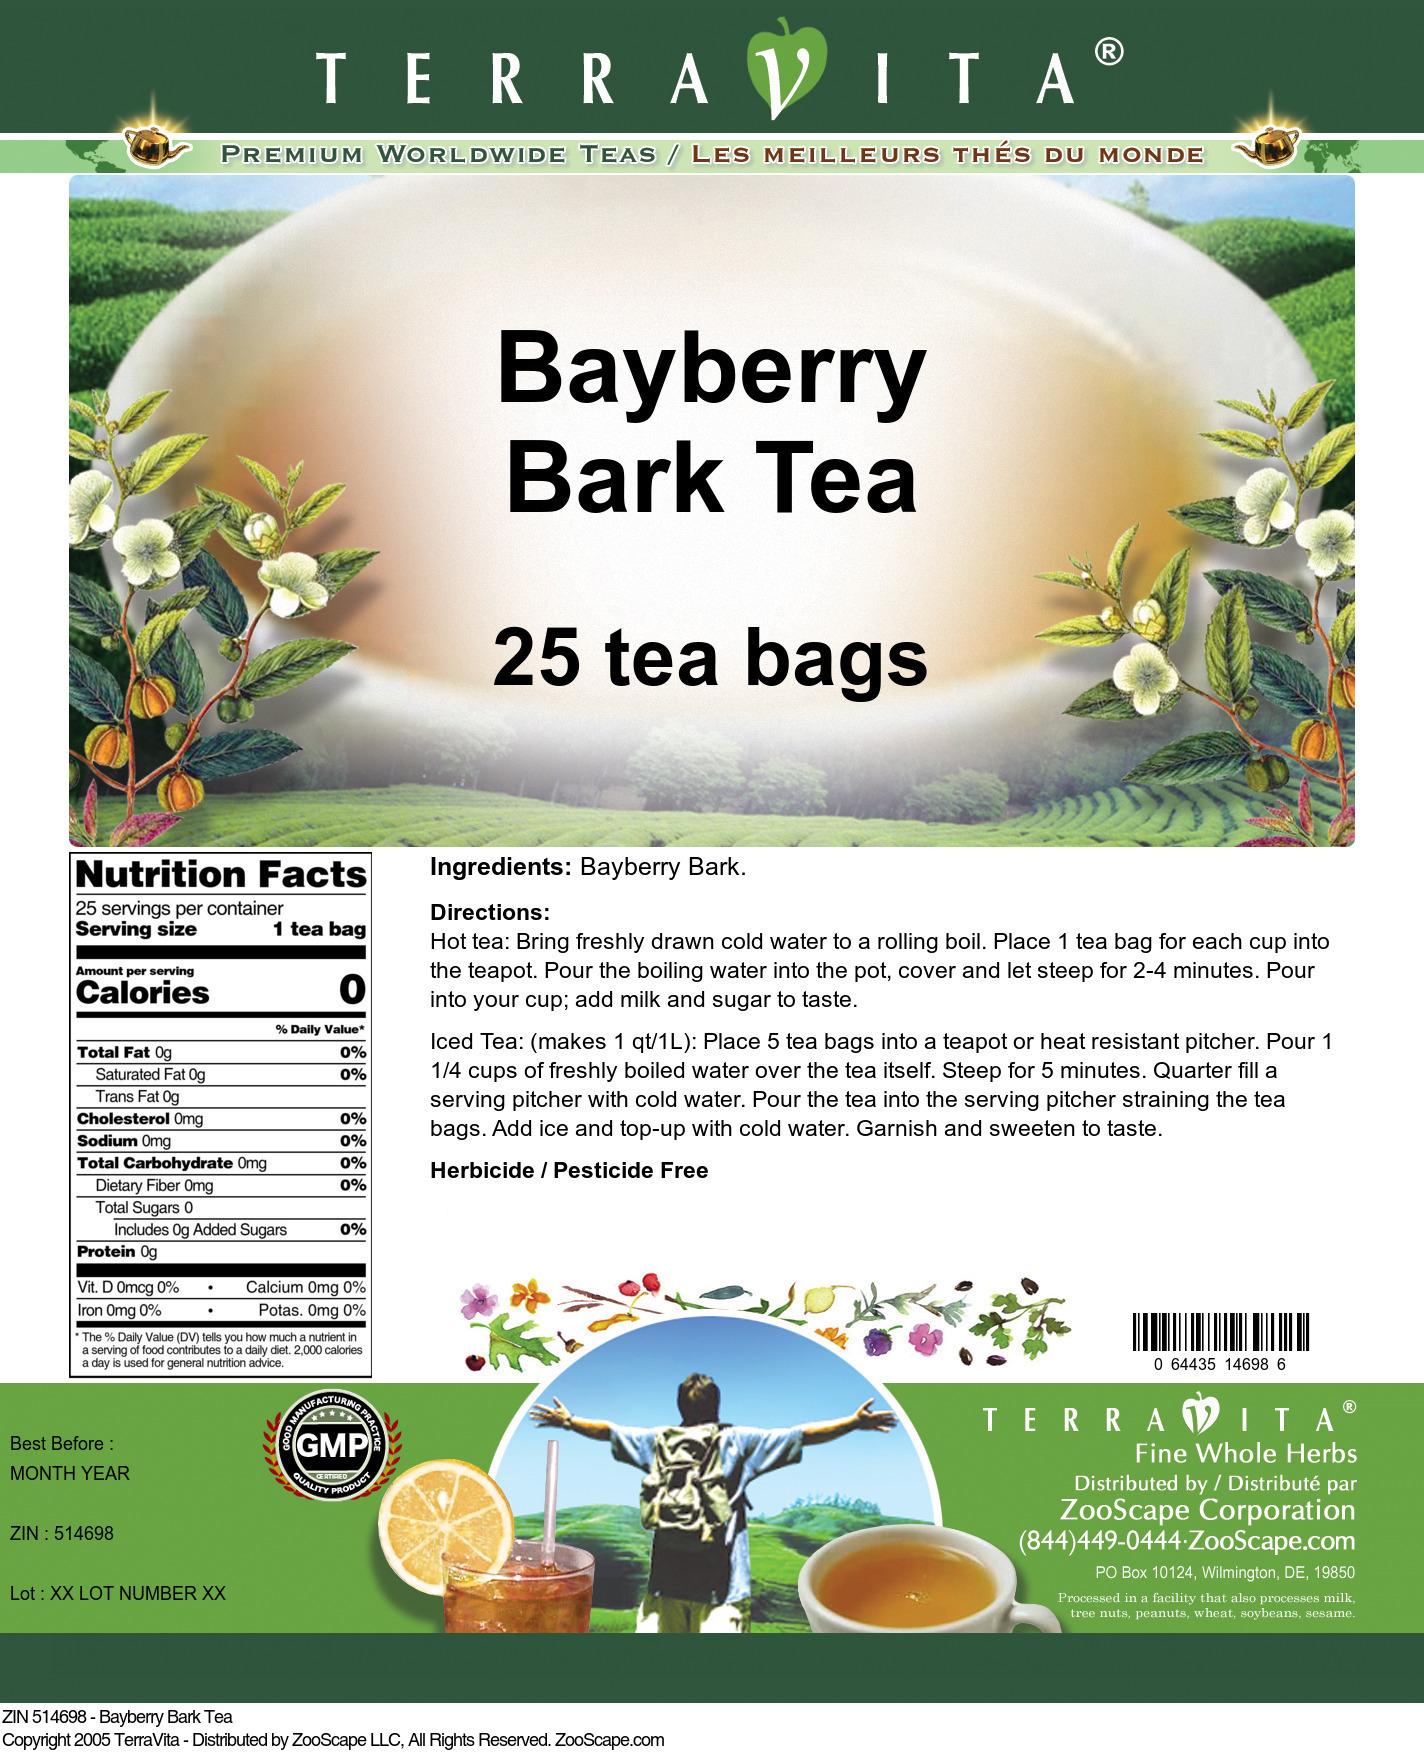 Bayberry Bark Tea